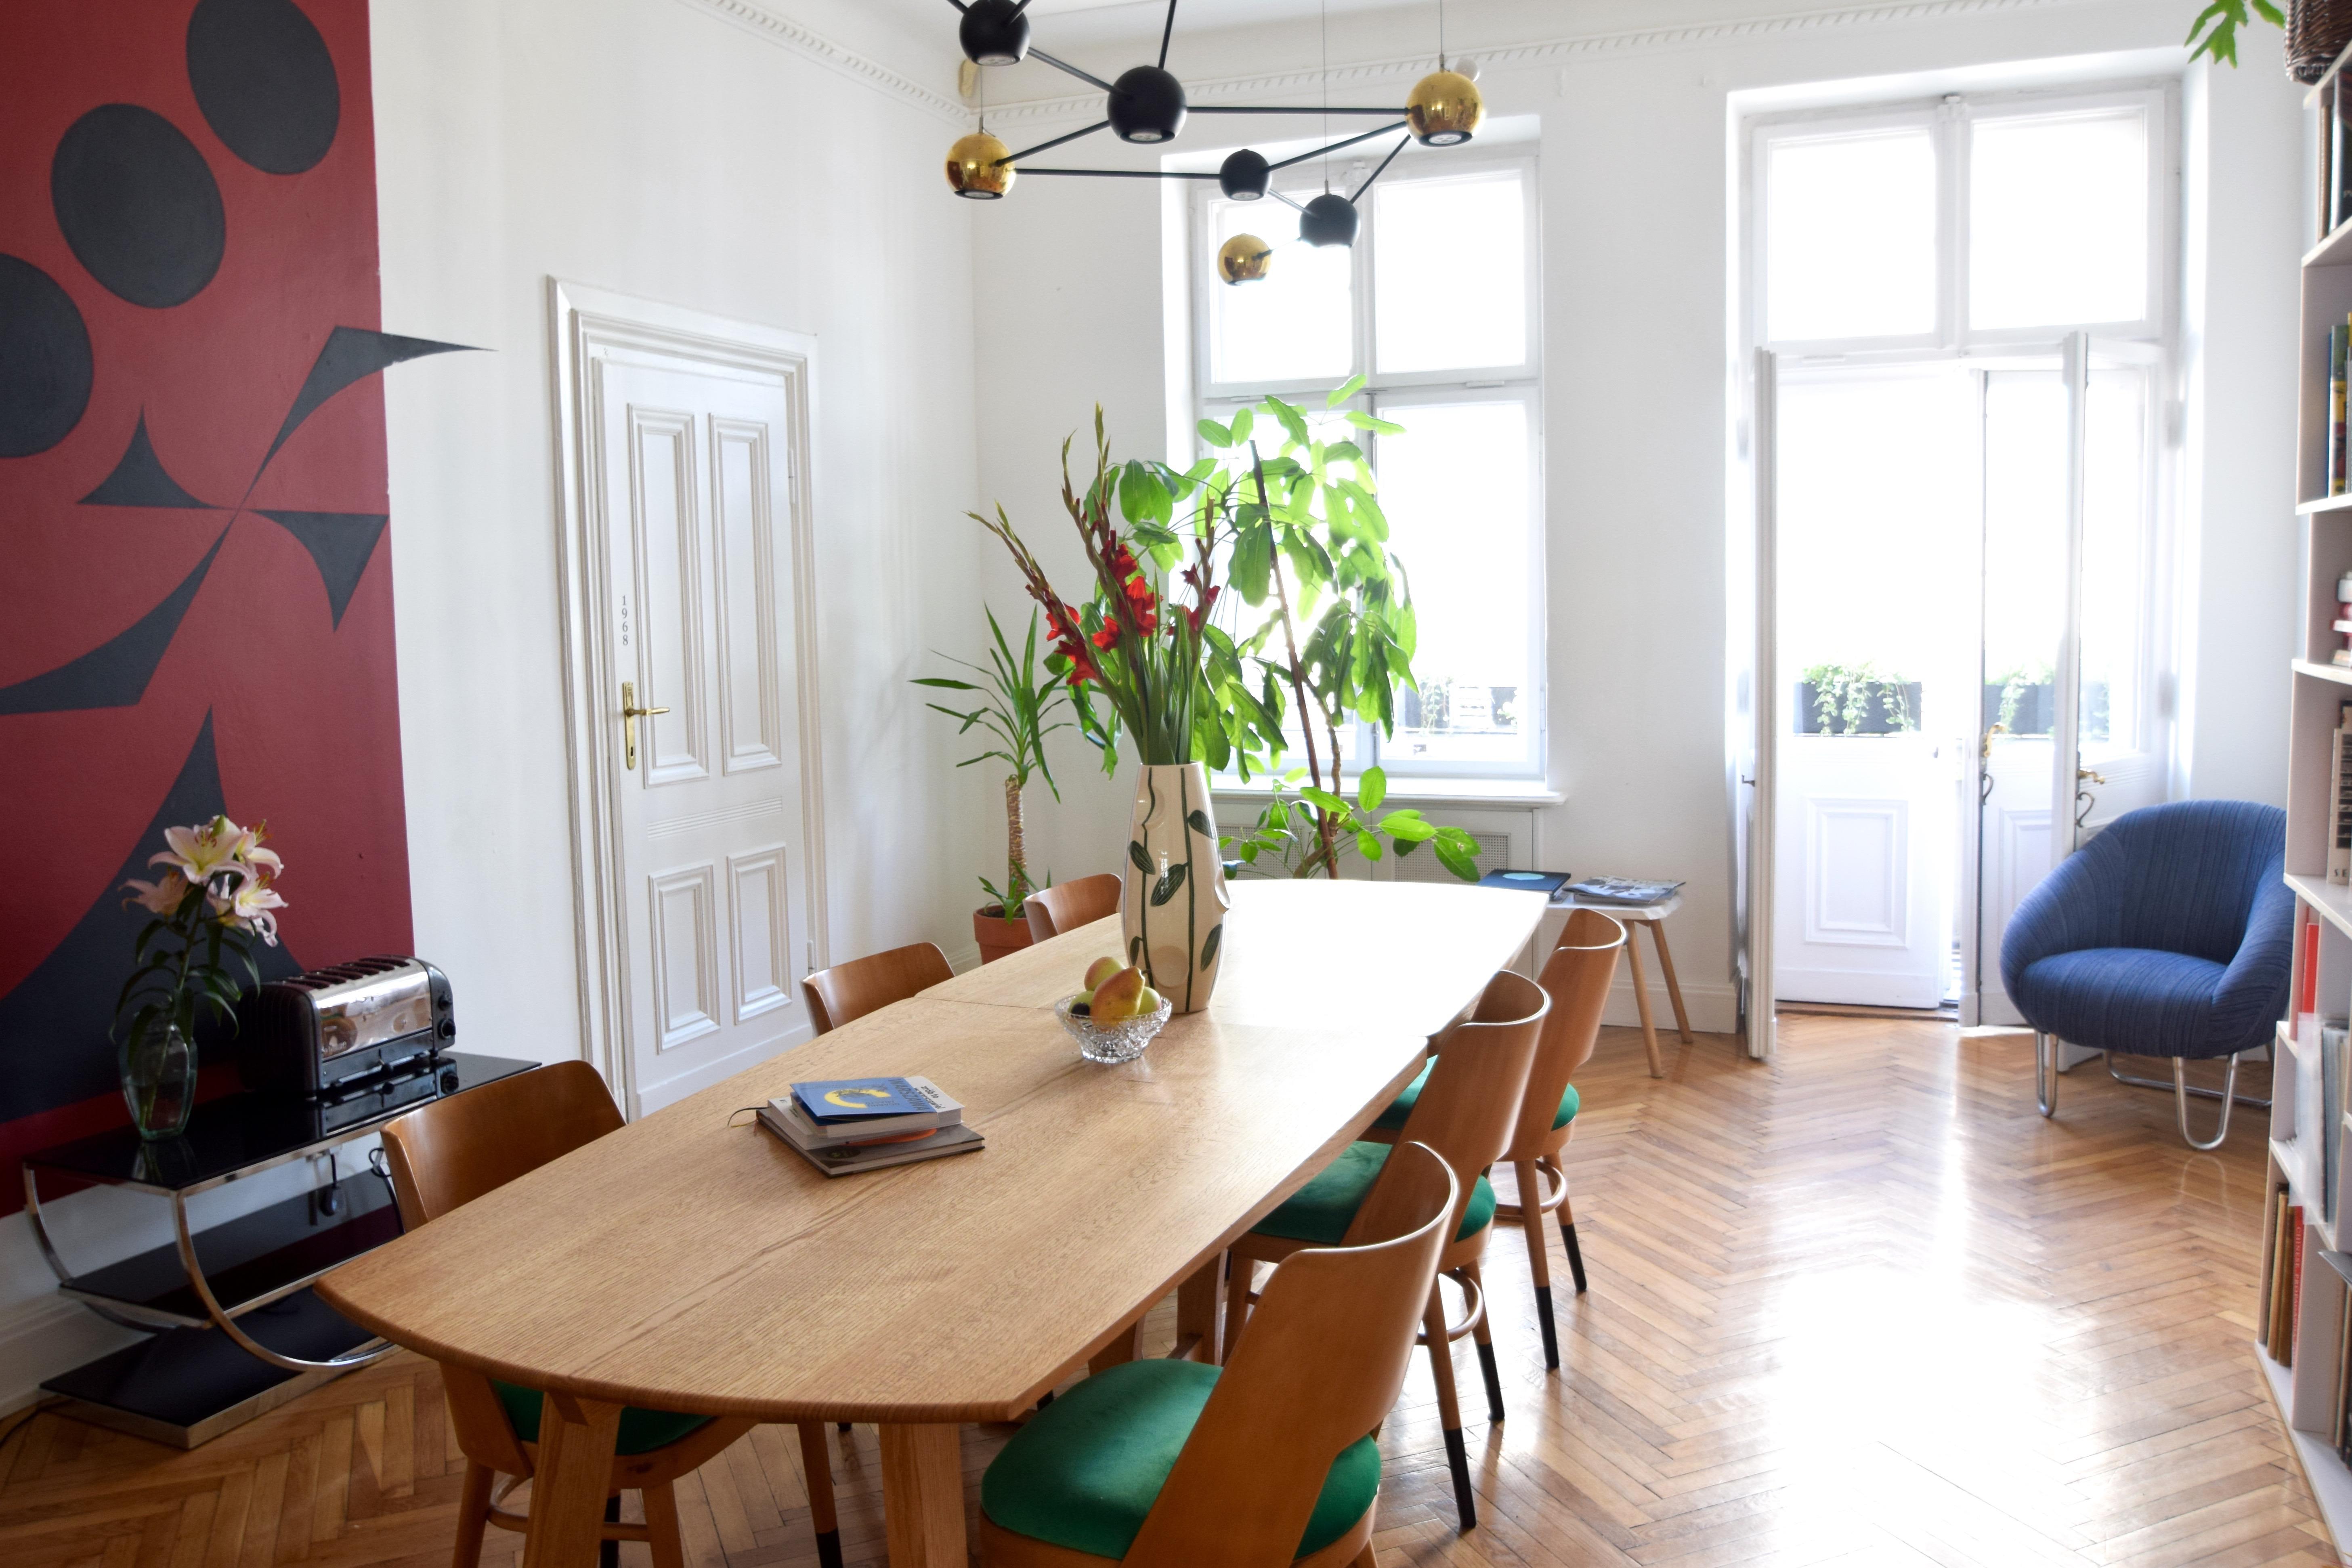 http://www.cloclo.be/wp-content/uploads/2016/09/Autor-Rooms-Warschau-interieur-hotel-leefruimte.jpg